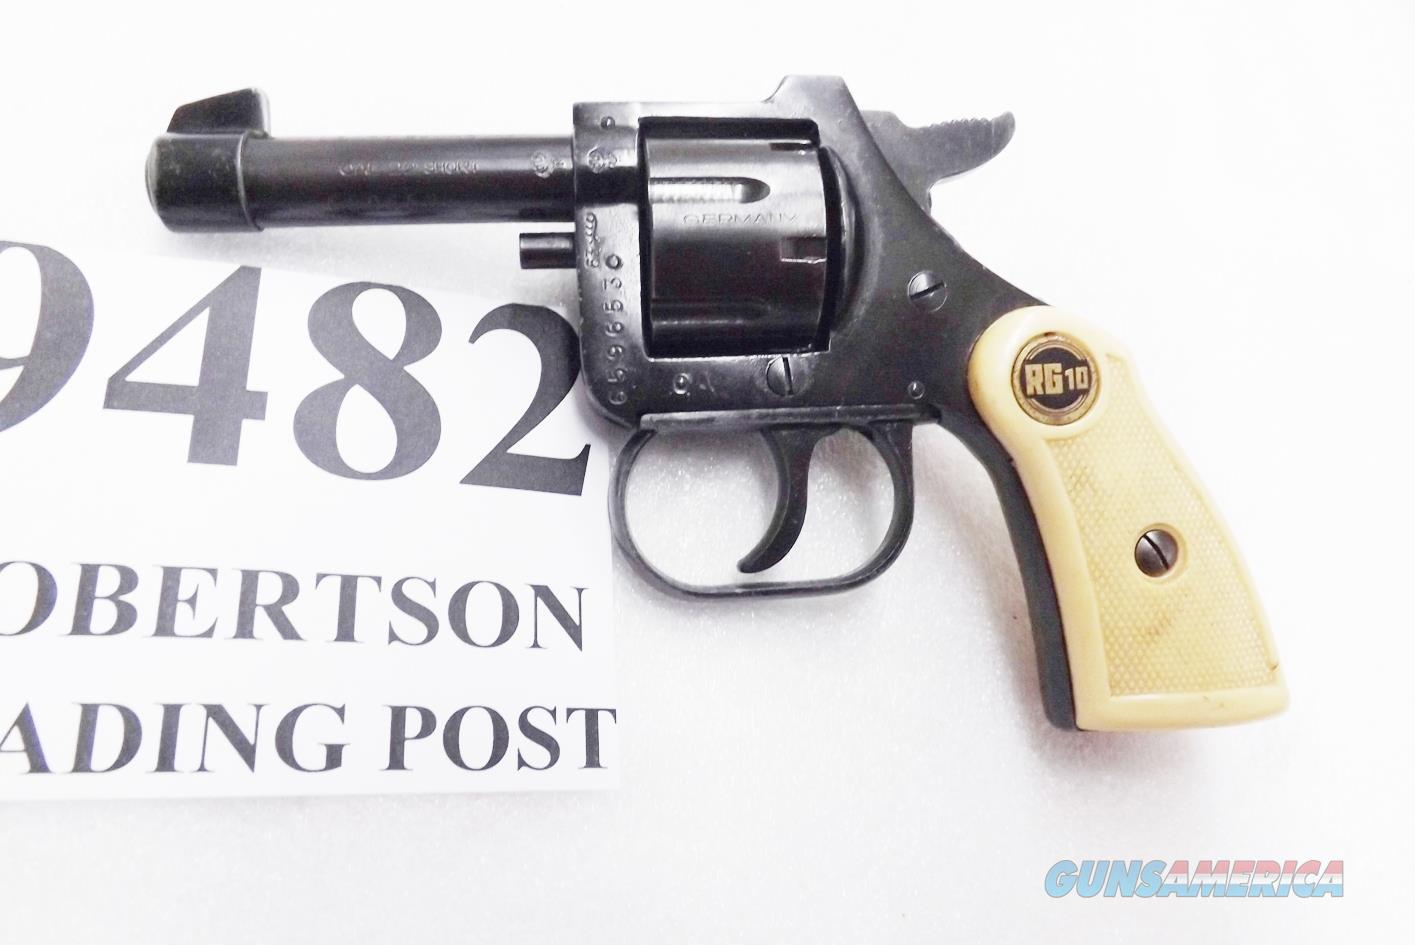 Rohm .22 Short model RG10 Revolver 1963 Production 2 7/8 inch 6 Shot Very Good Condition but No Ejector Rod Blue   Guns > Pistols > FIE Pistols